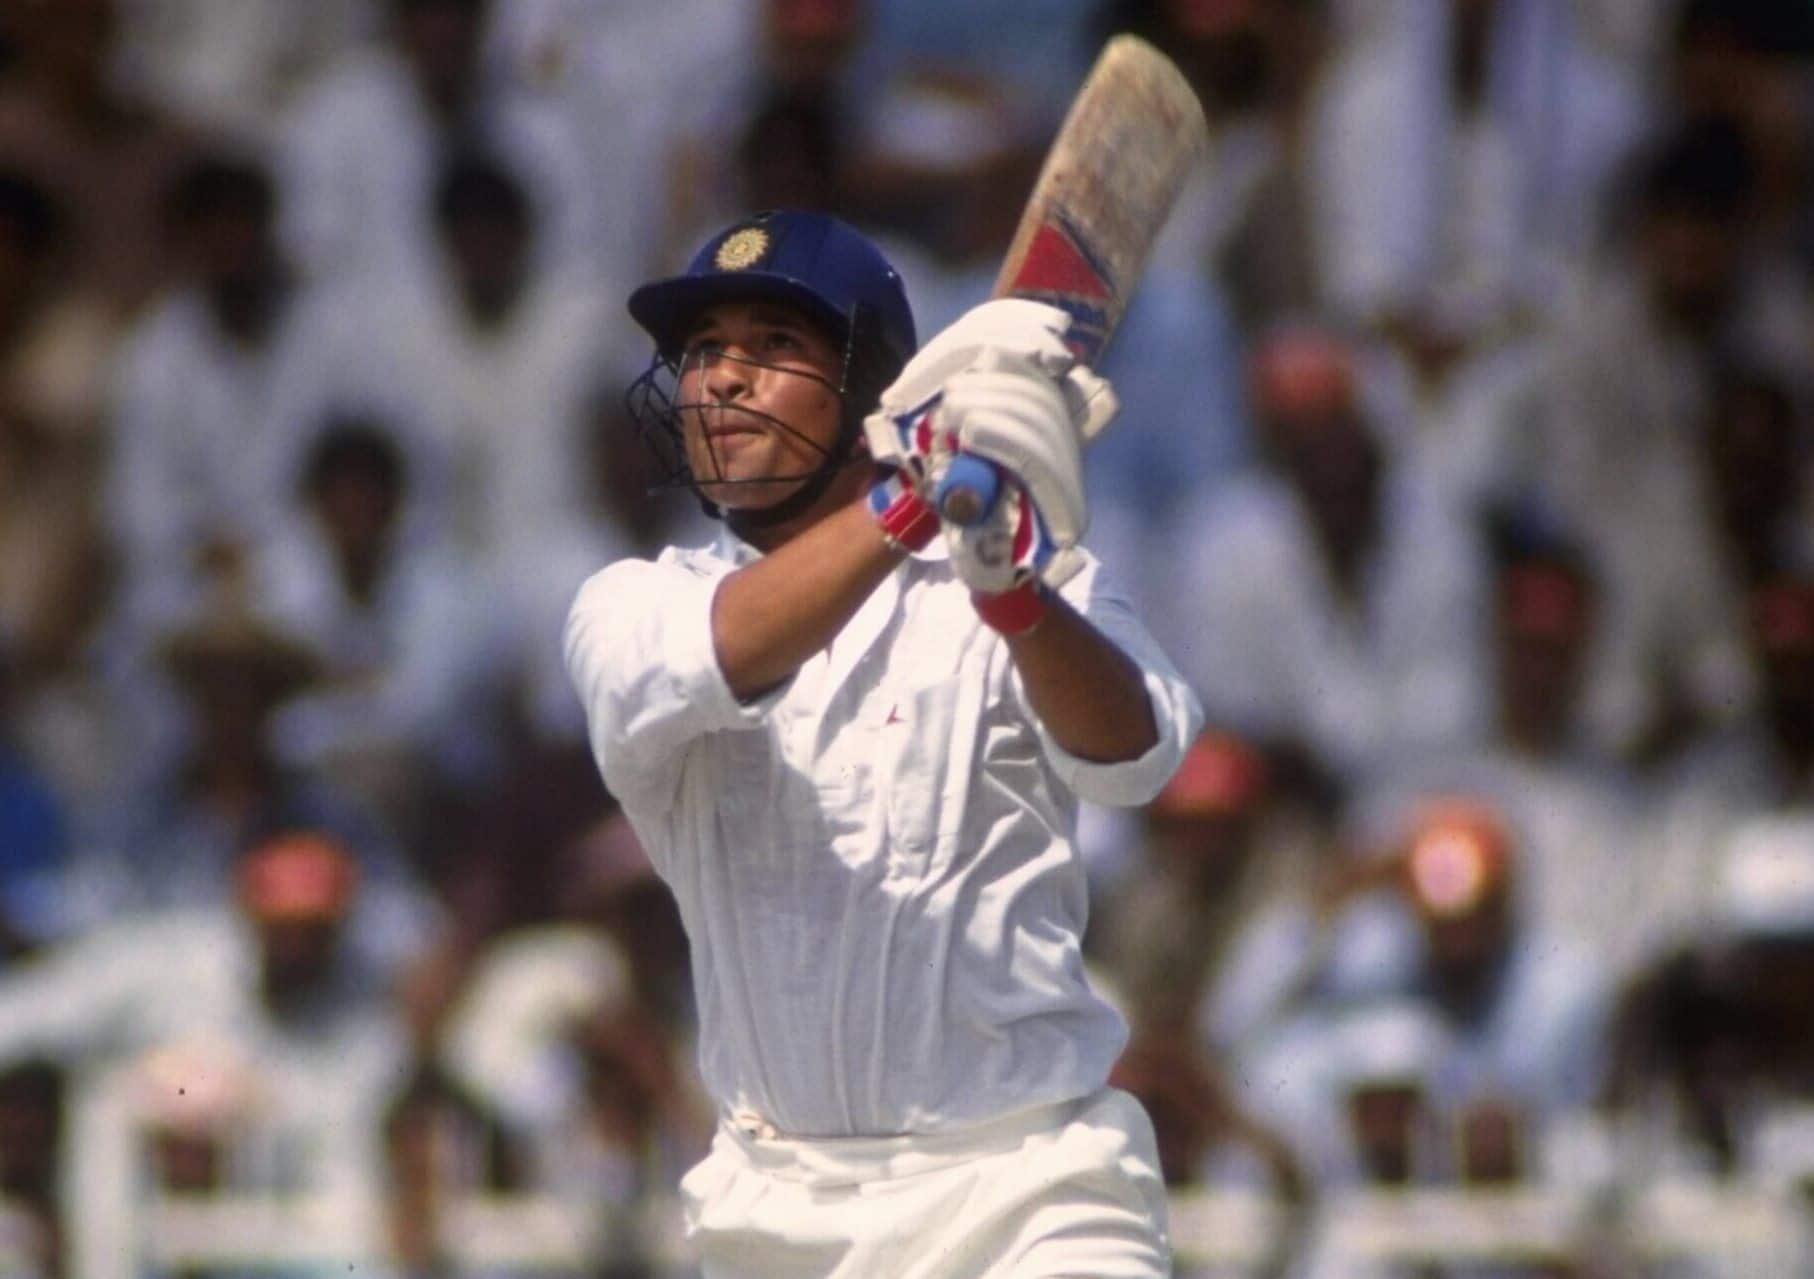 Sachin Tendulkar's 118 in a 231-run stand with Navjot Sidhu set up India's win in 1996.